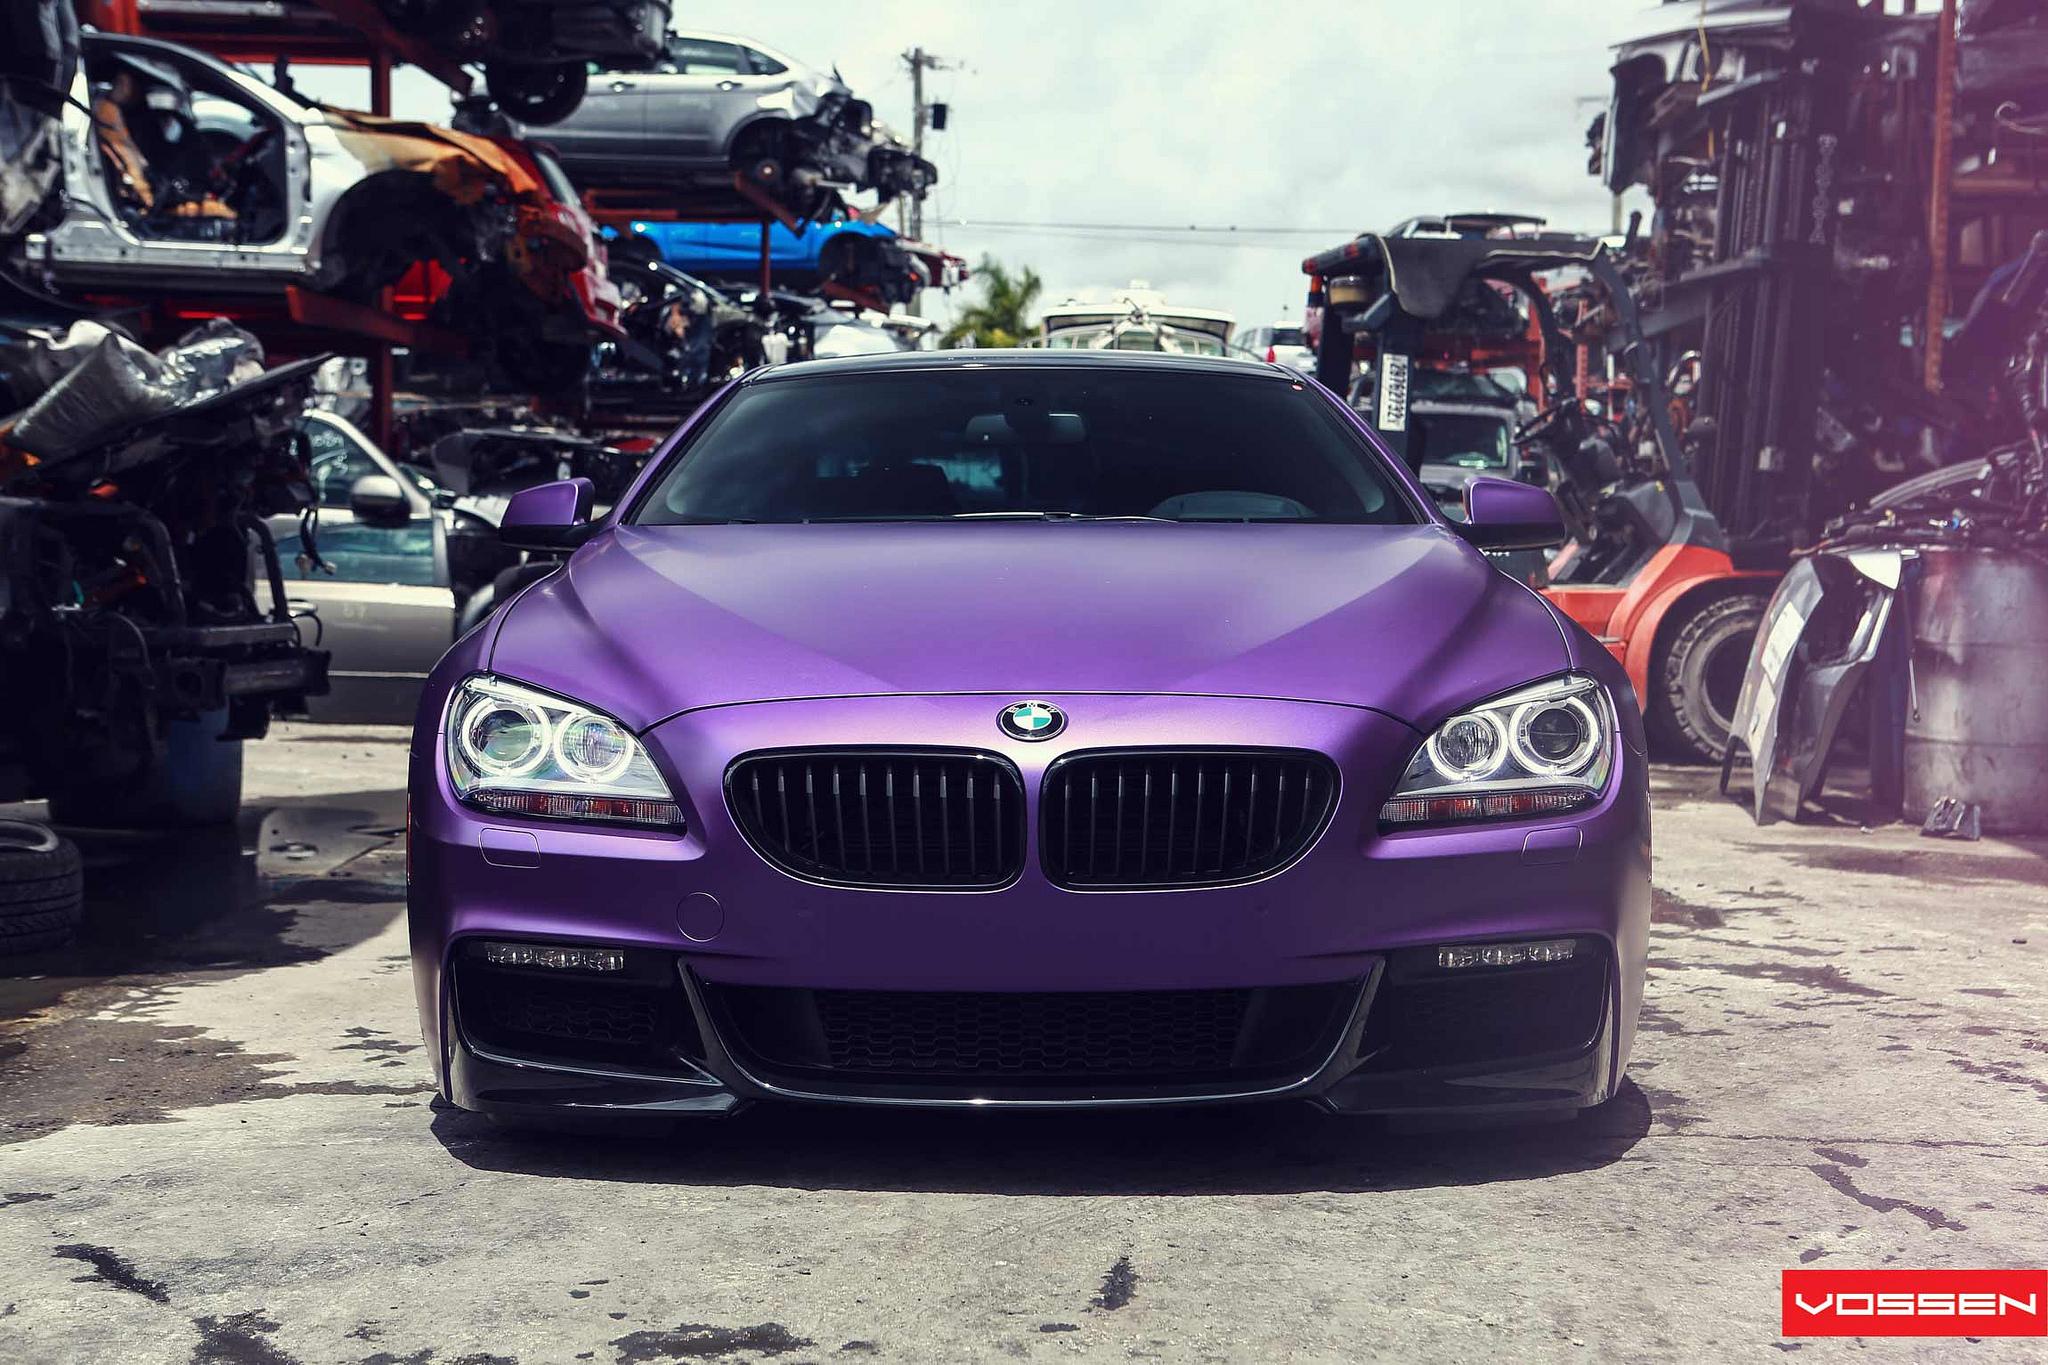 Frozen Purple Bmw 6 Series Coupe Does Photo Shoot In Scrapyard Autoevolution